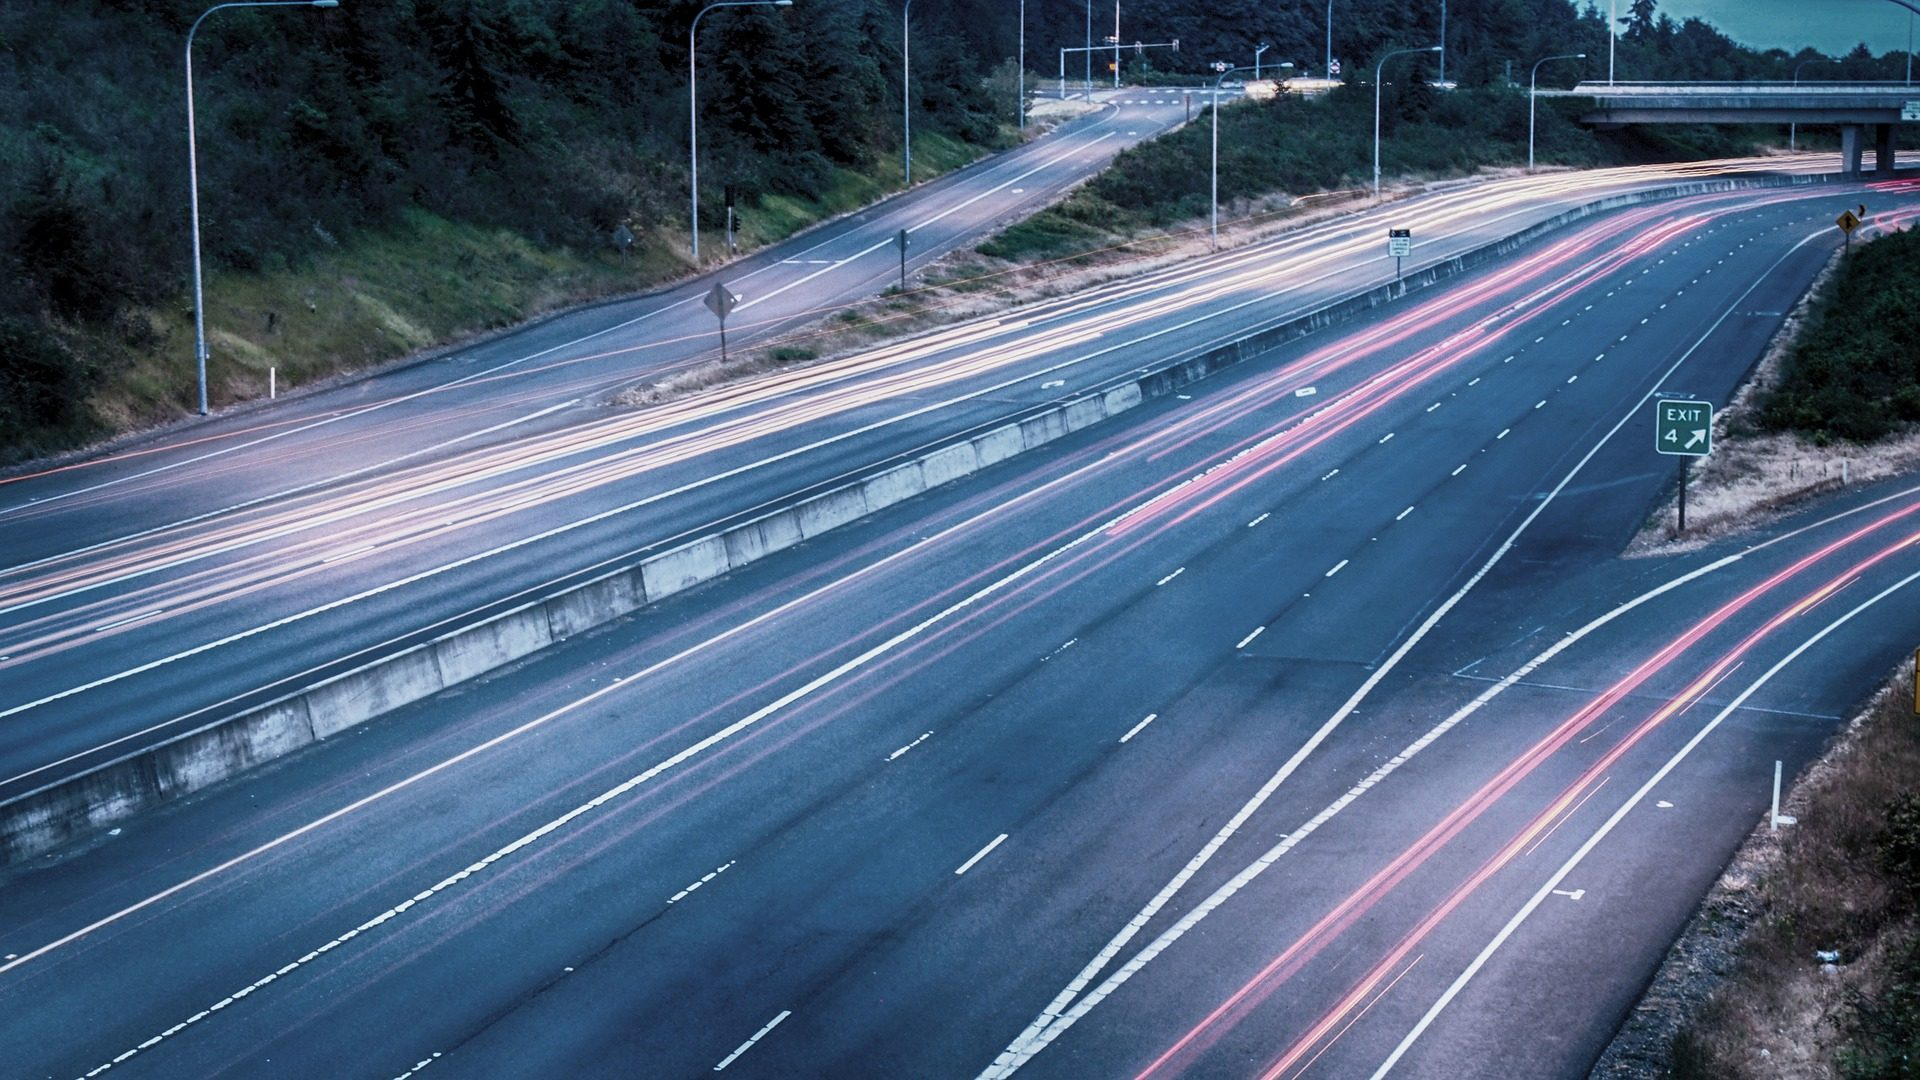 autopista, सड़क, रोशनी, वाहनों, गति - HD वॉलपेपर - प्रोफेसर-falken.com